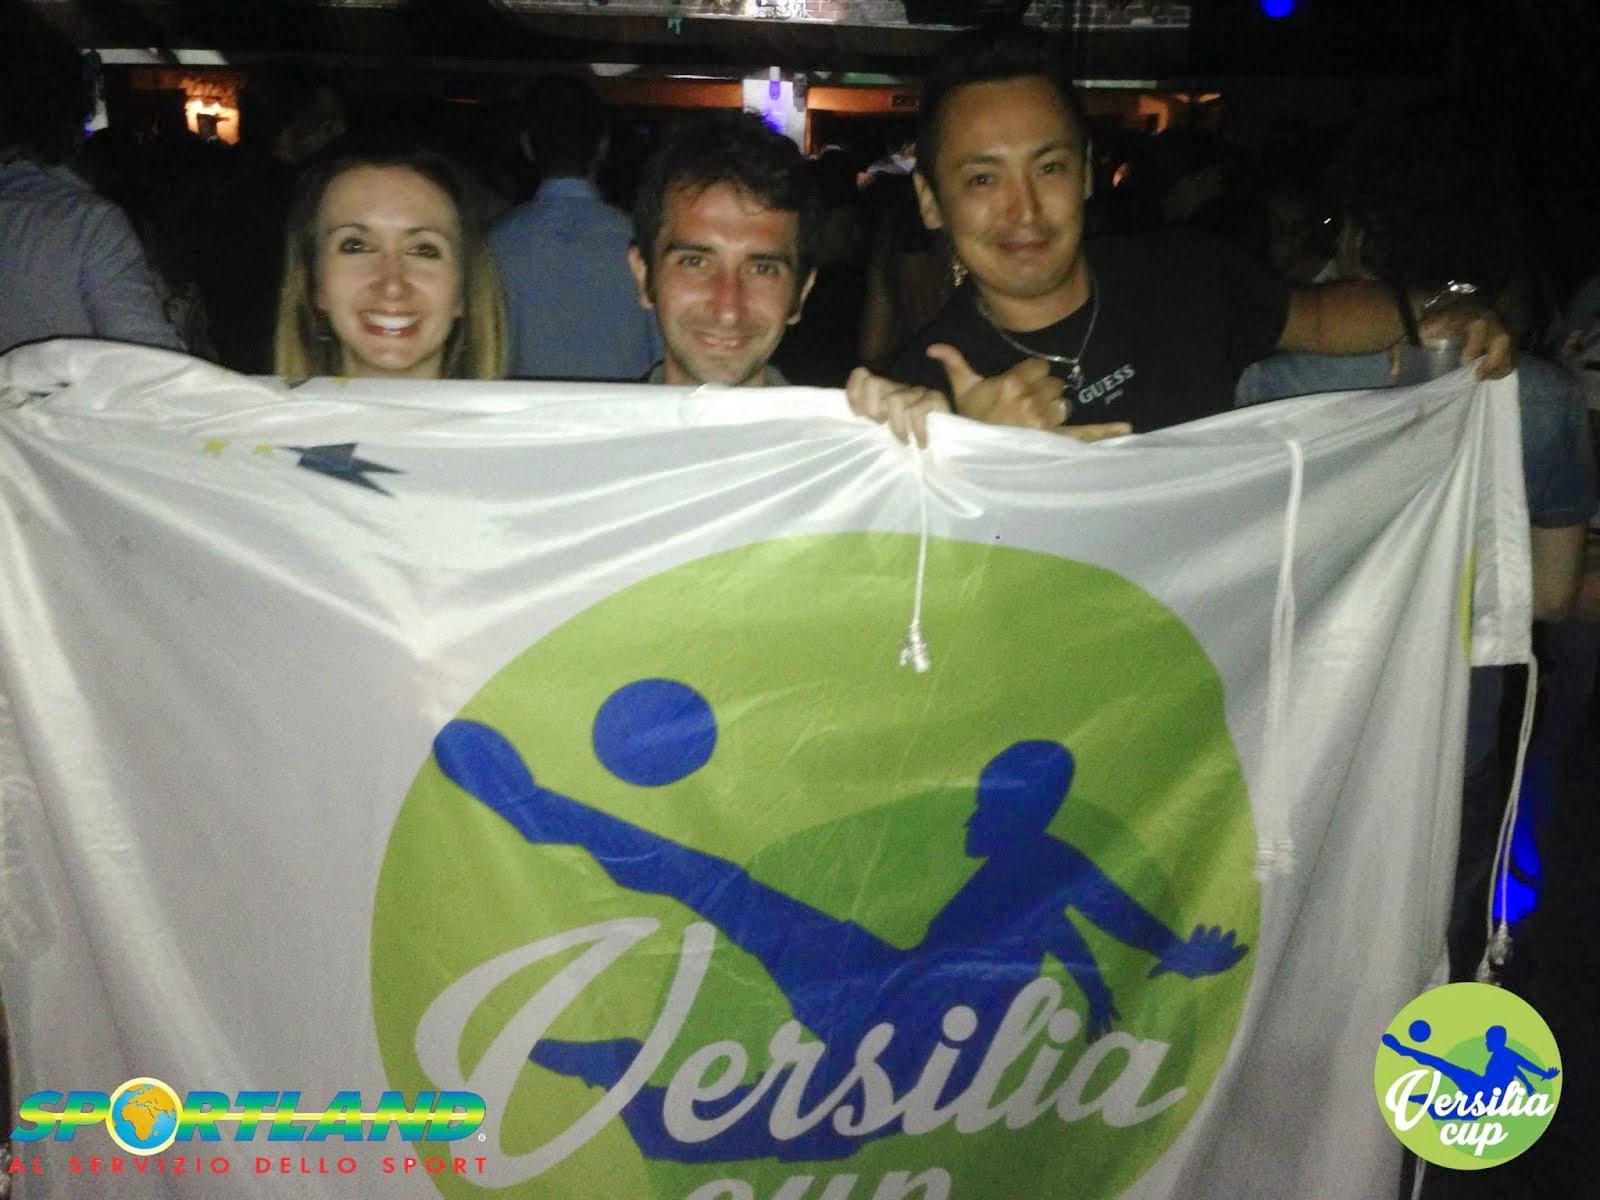 Brasitalianos testimonial della Versilia Cup